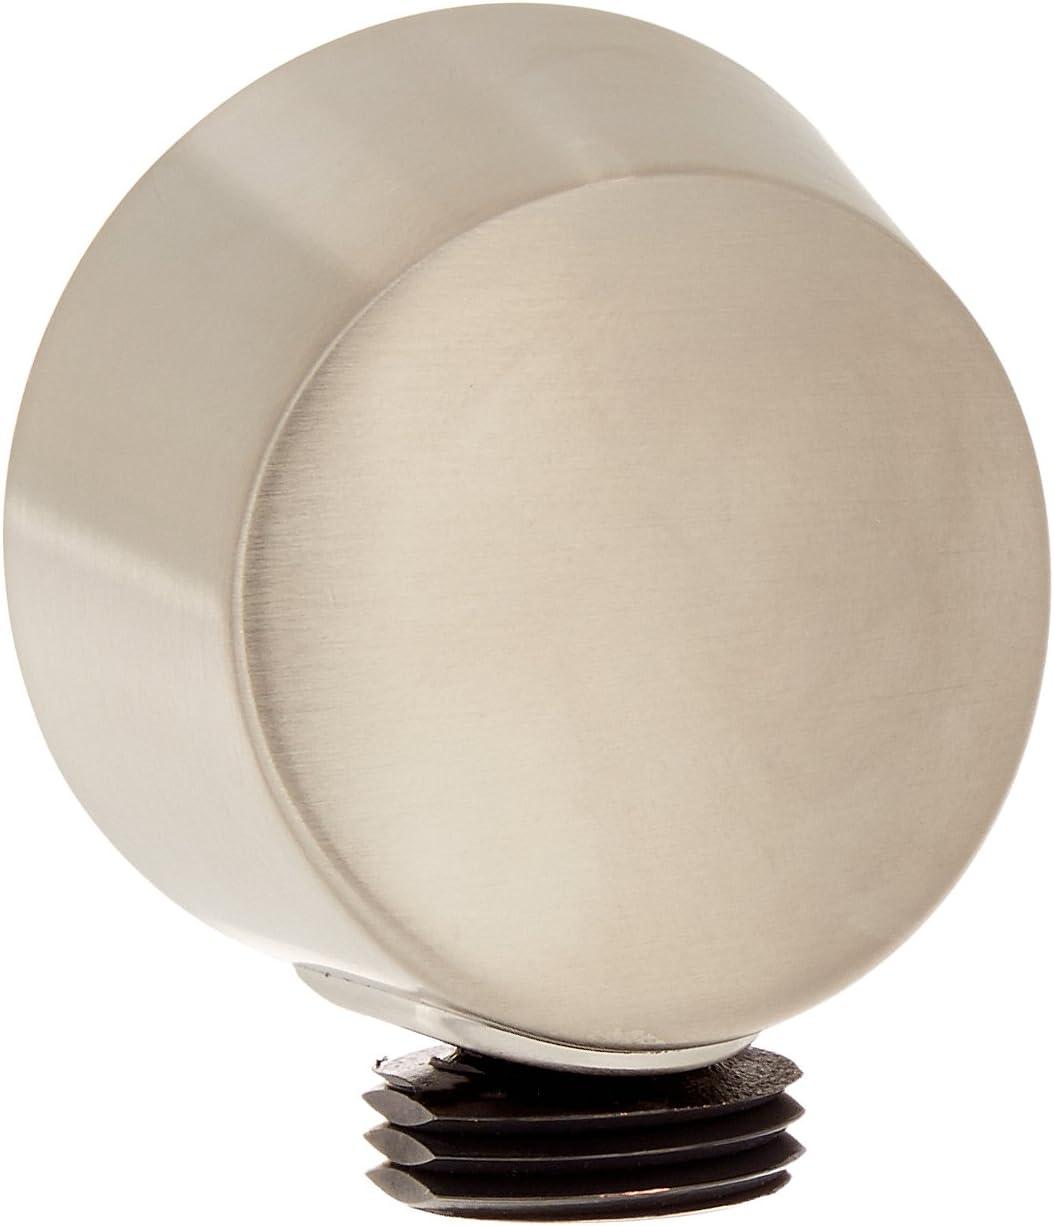 Moen Wholesale A725CBN Collection Round Drop Shower Wall Manufacturer OFFicial shop Ell Handheld Conn